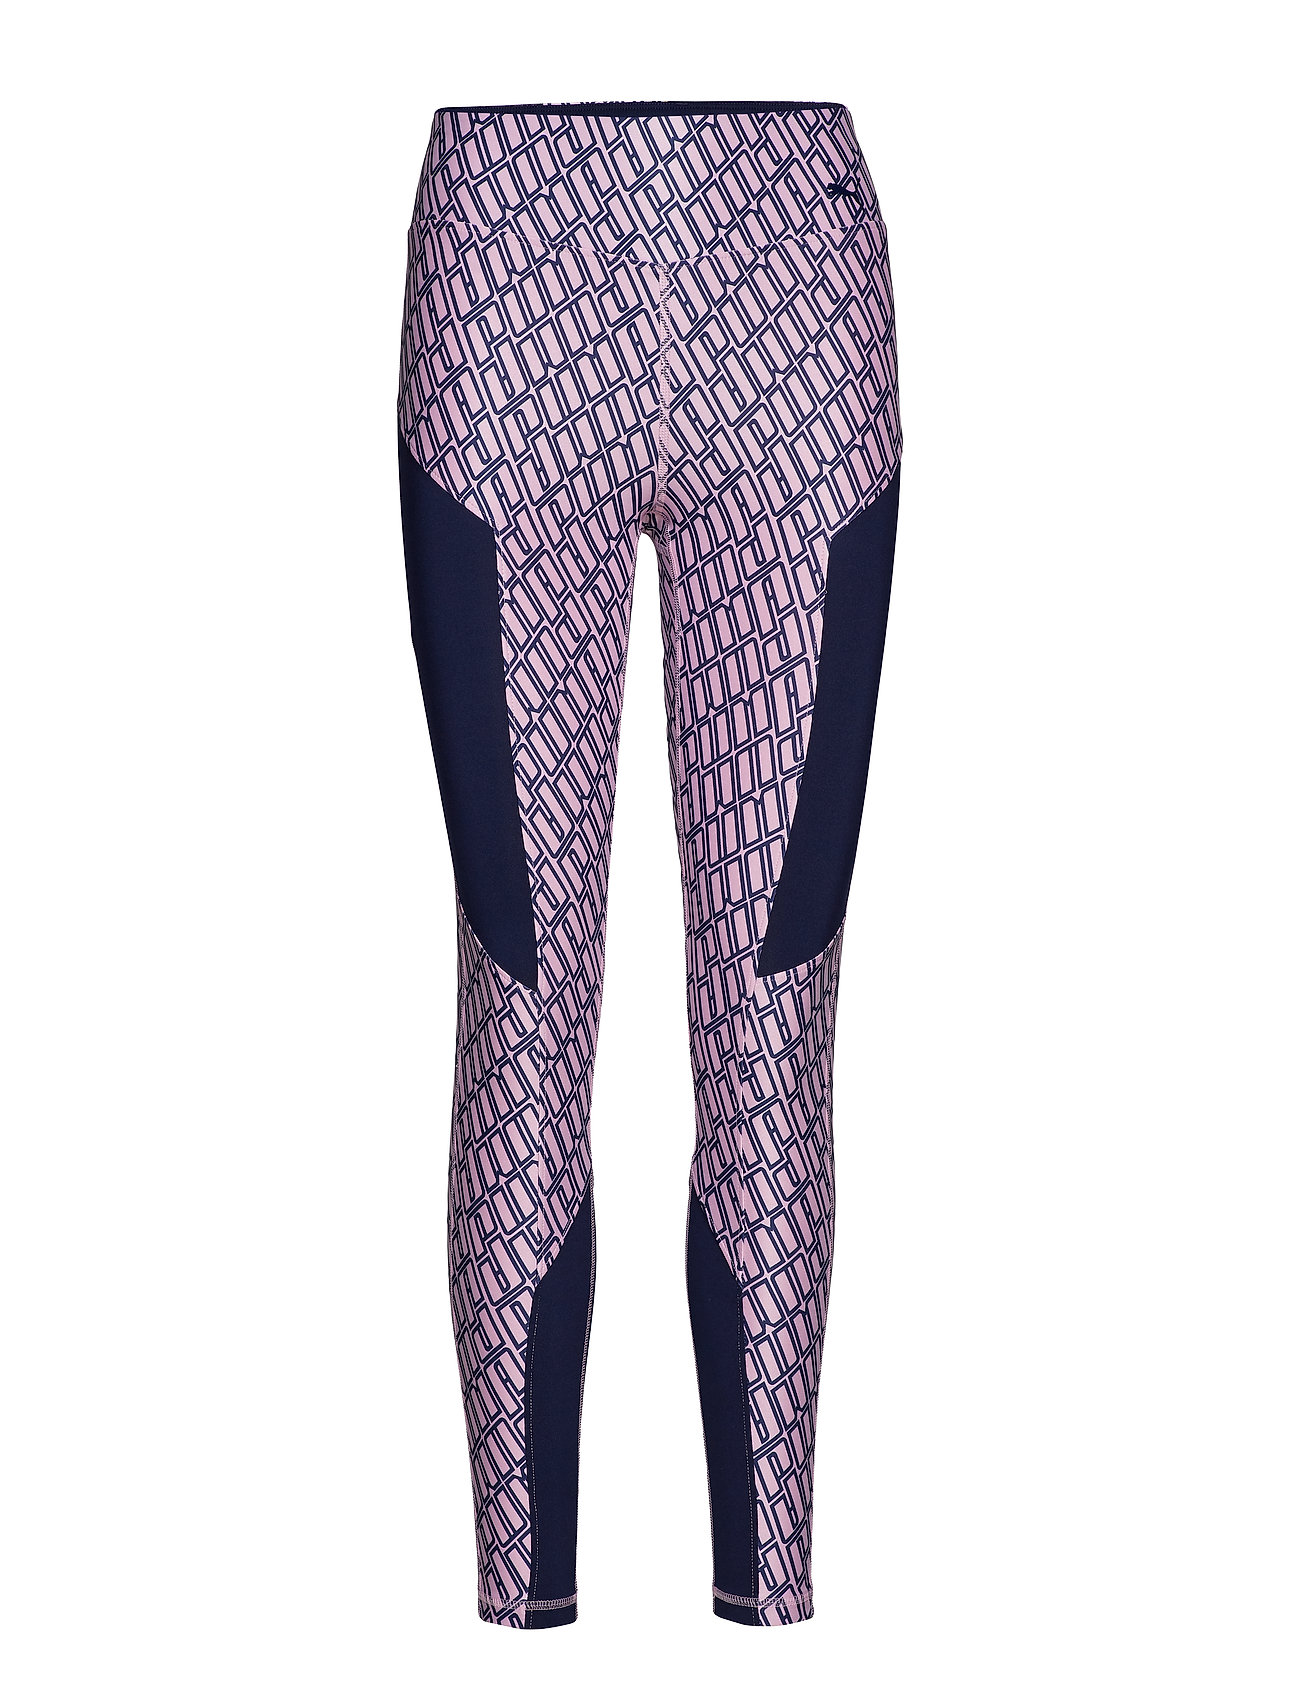 PUMA Bold Graphic FullTight Leggings & tights